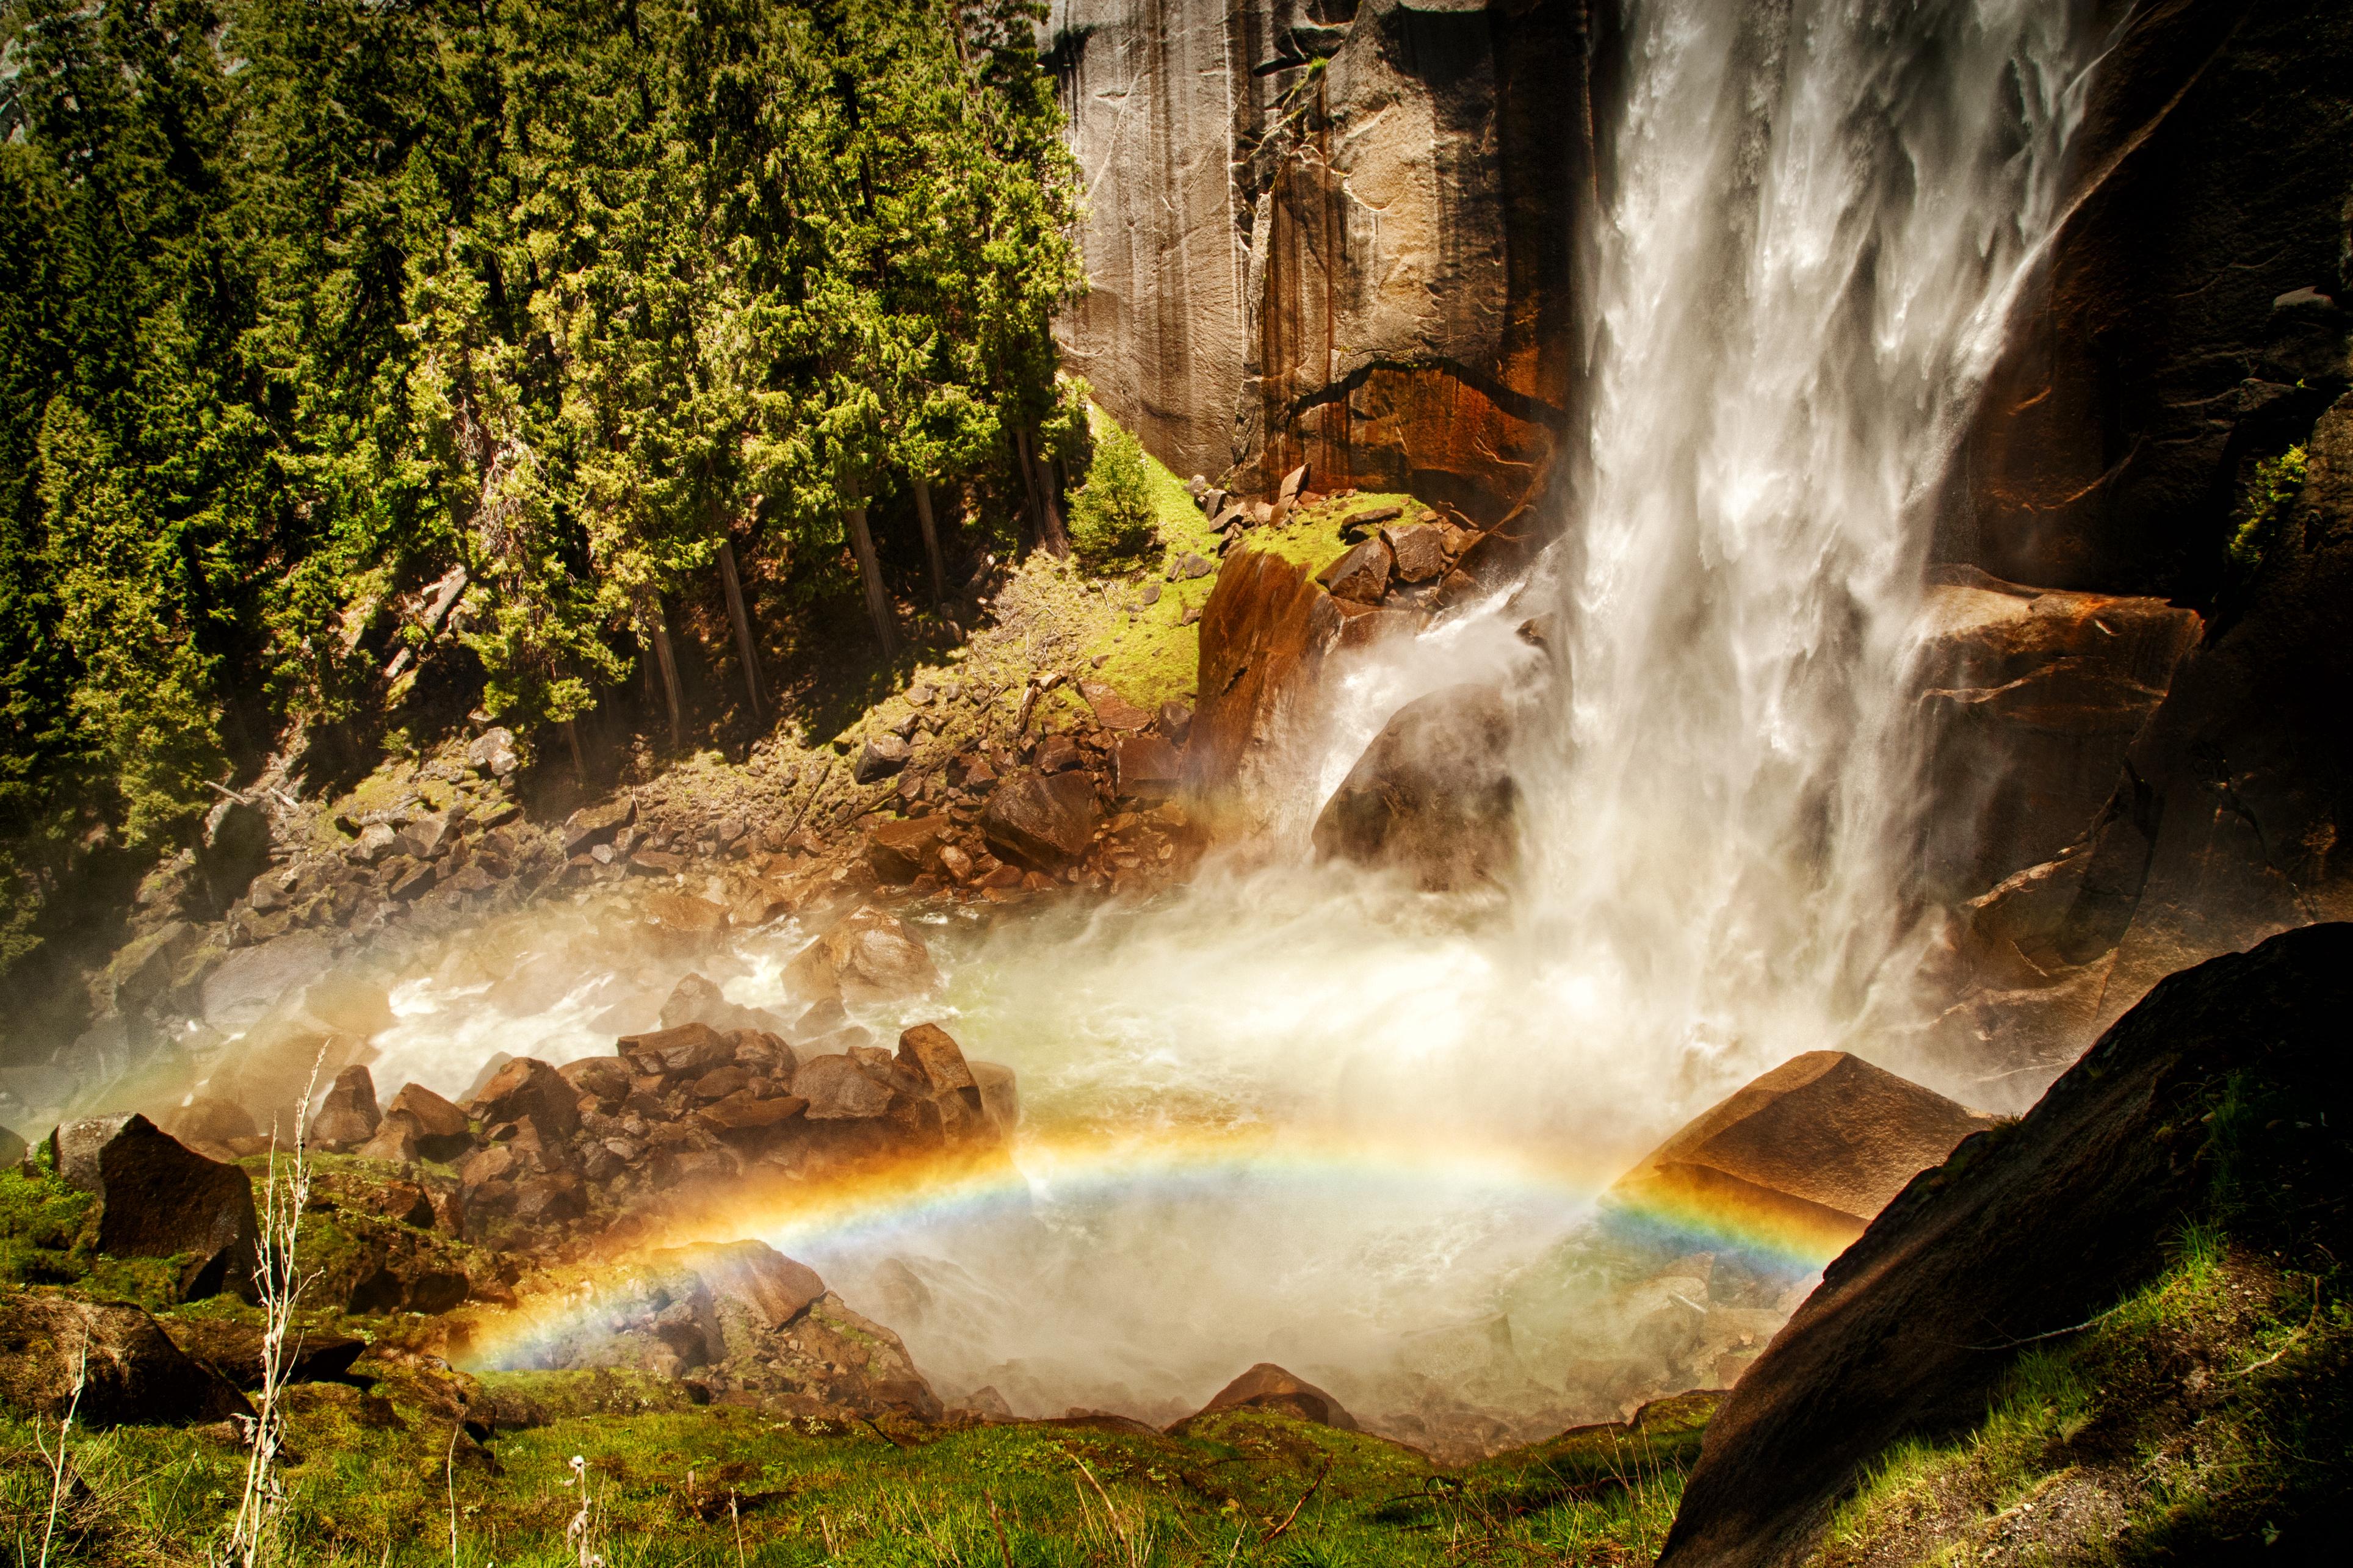 Vernal Falls Rainbow - Yosemite Valley photo   Nature Photos   Yosemite Vernal Falls Rainbow